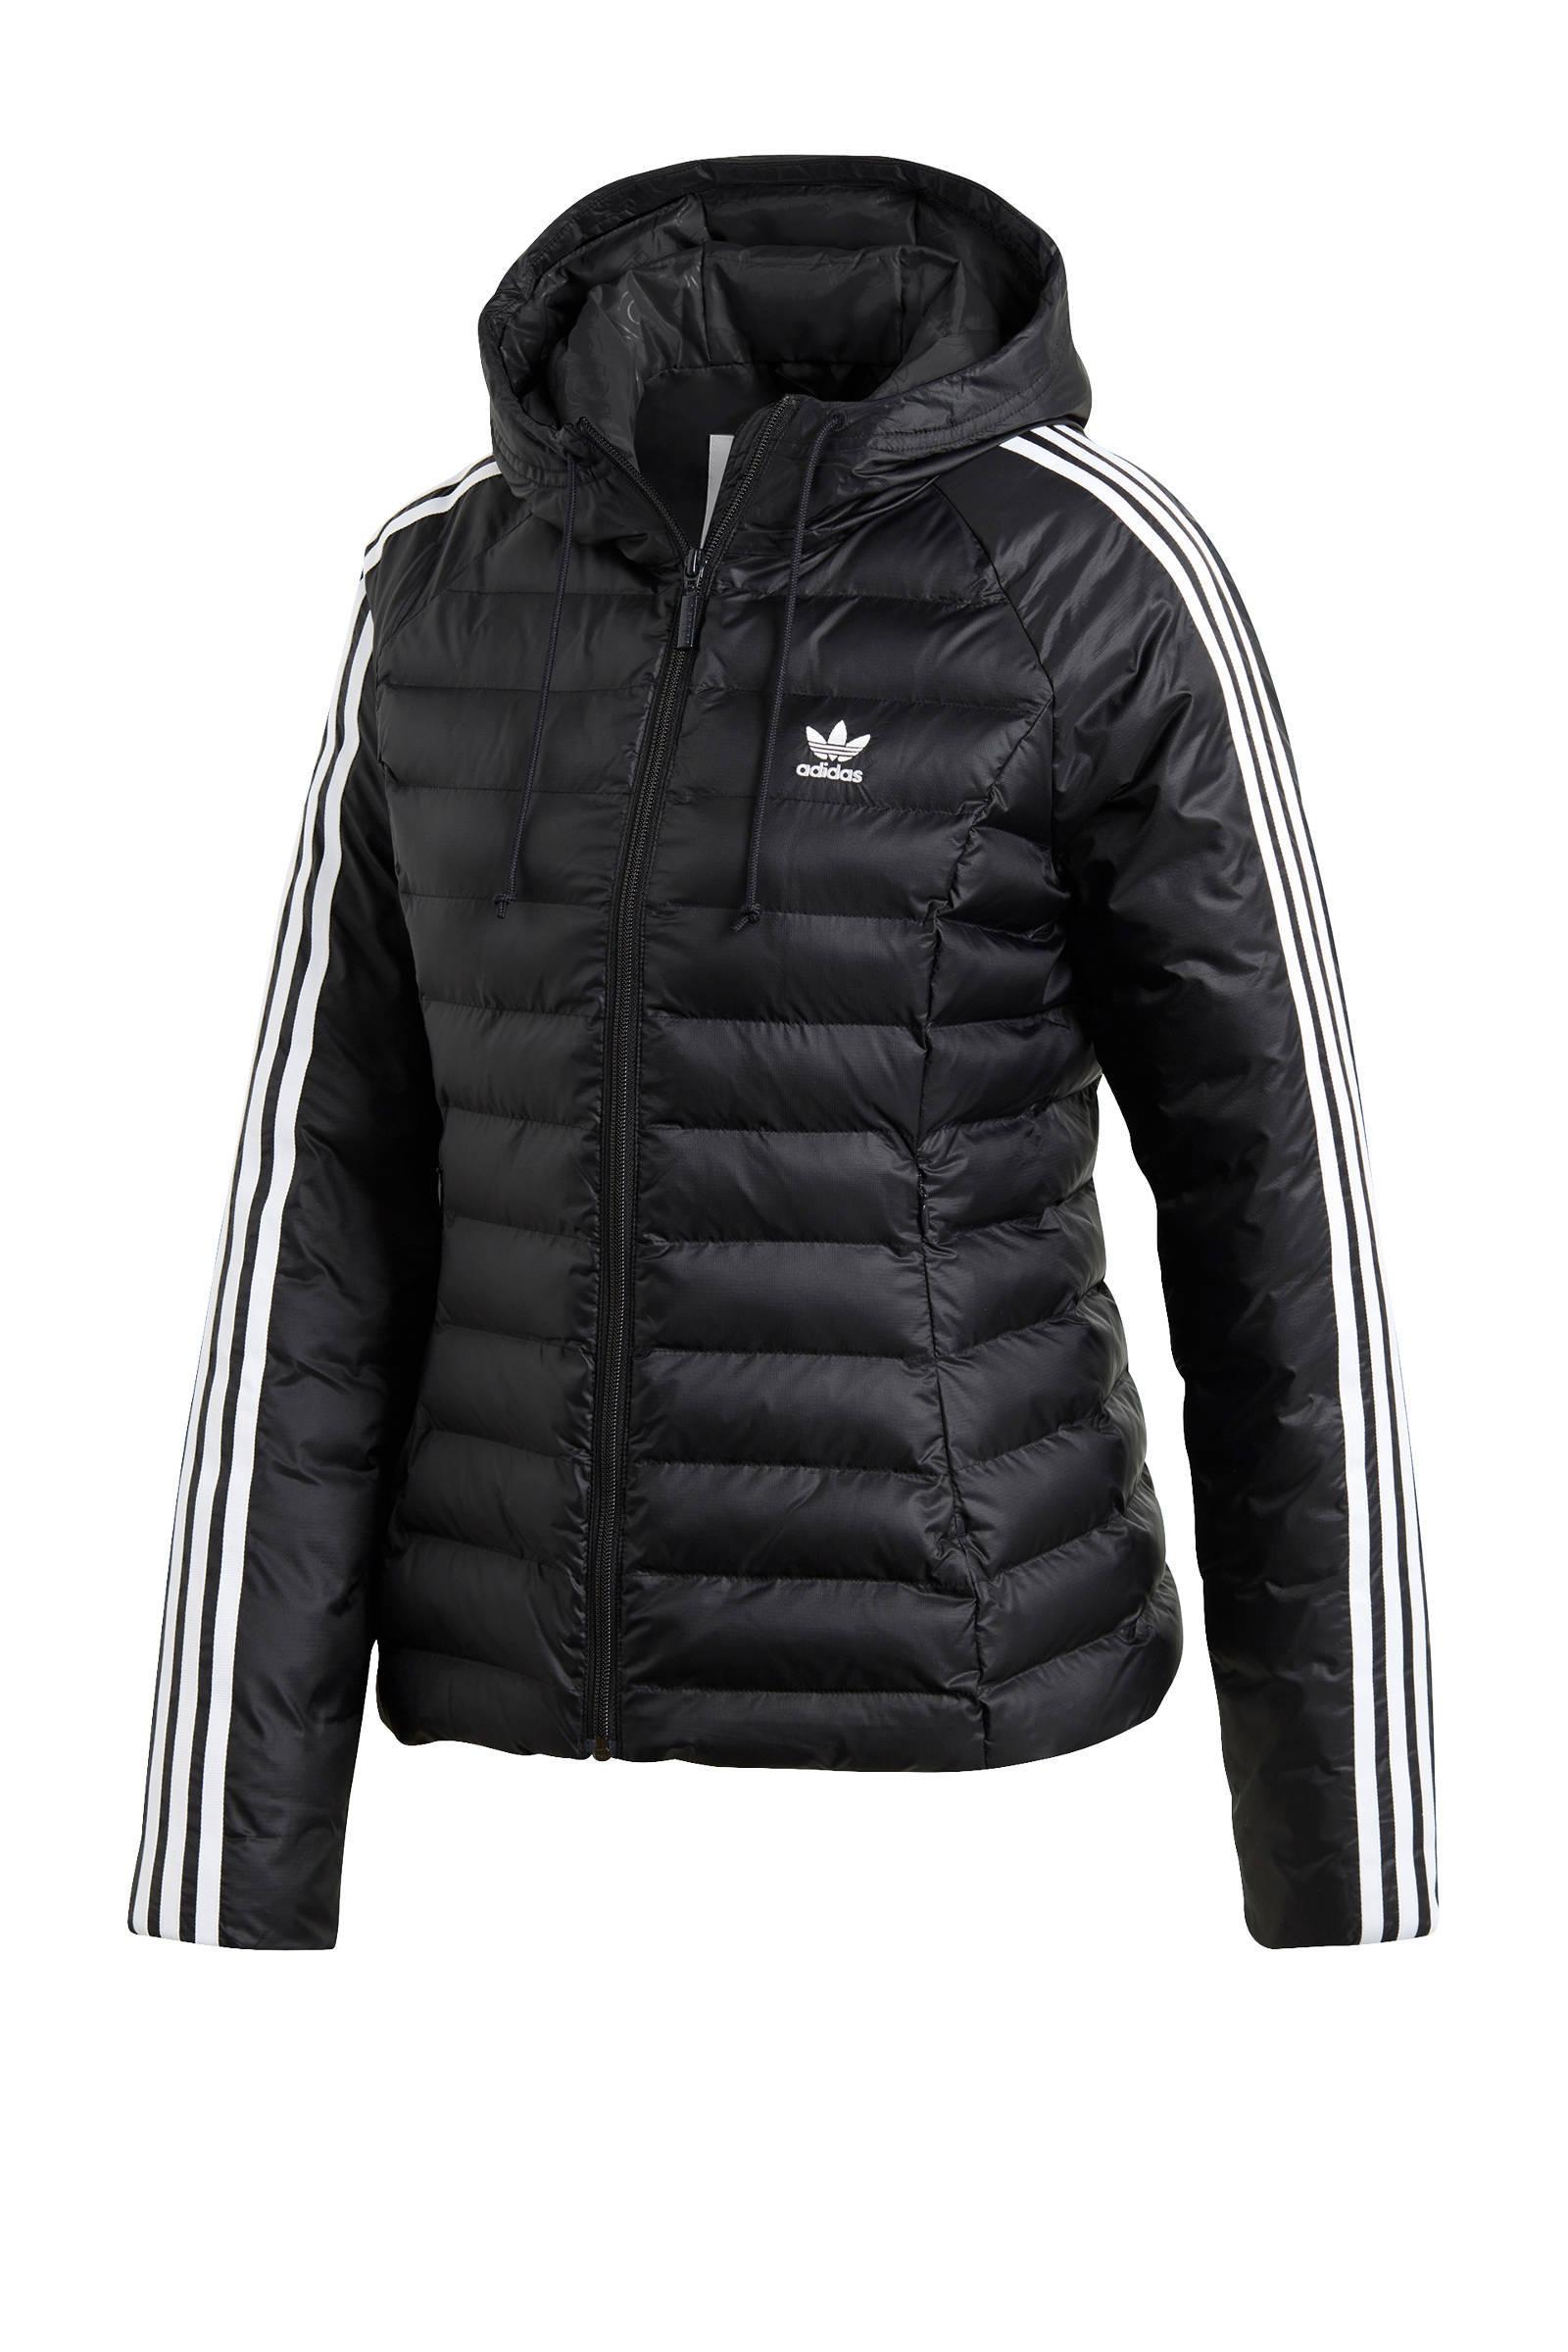 adidas Originals winterjas zwart | wehkamp